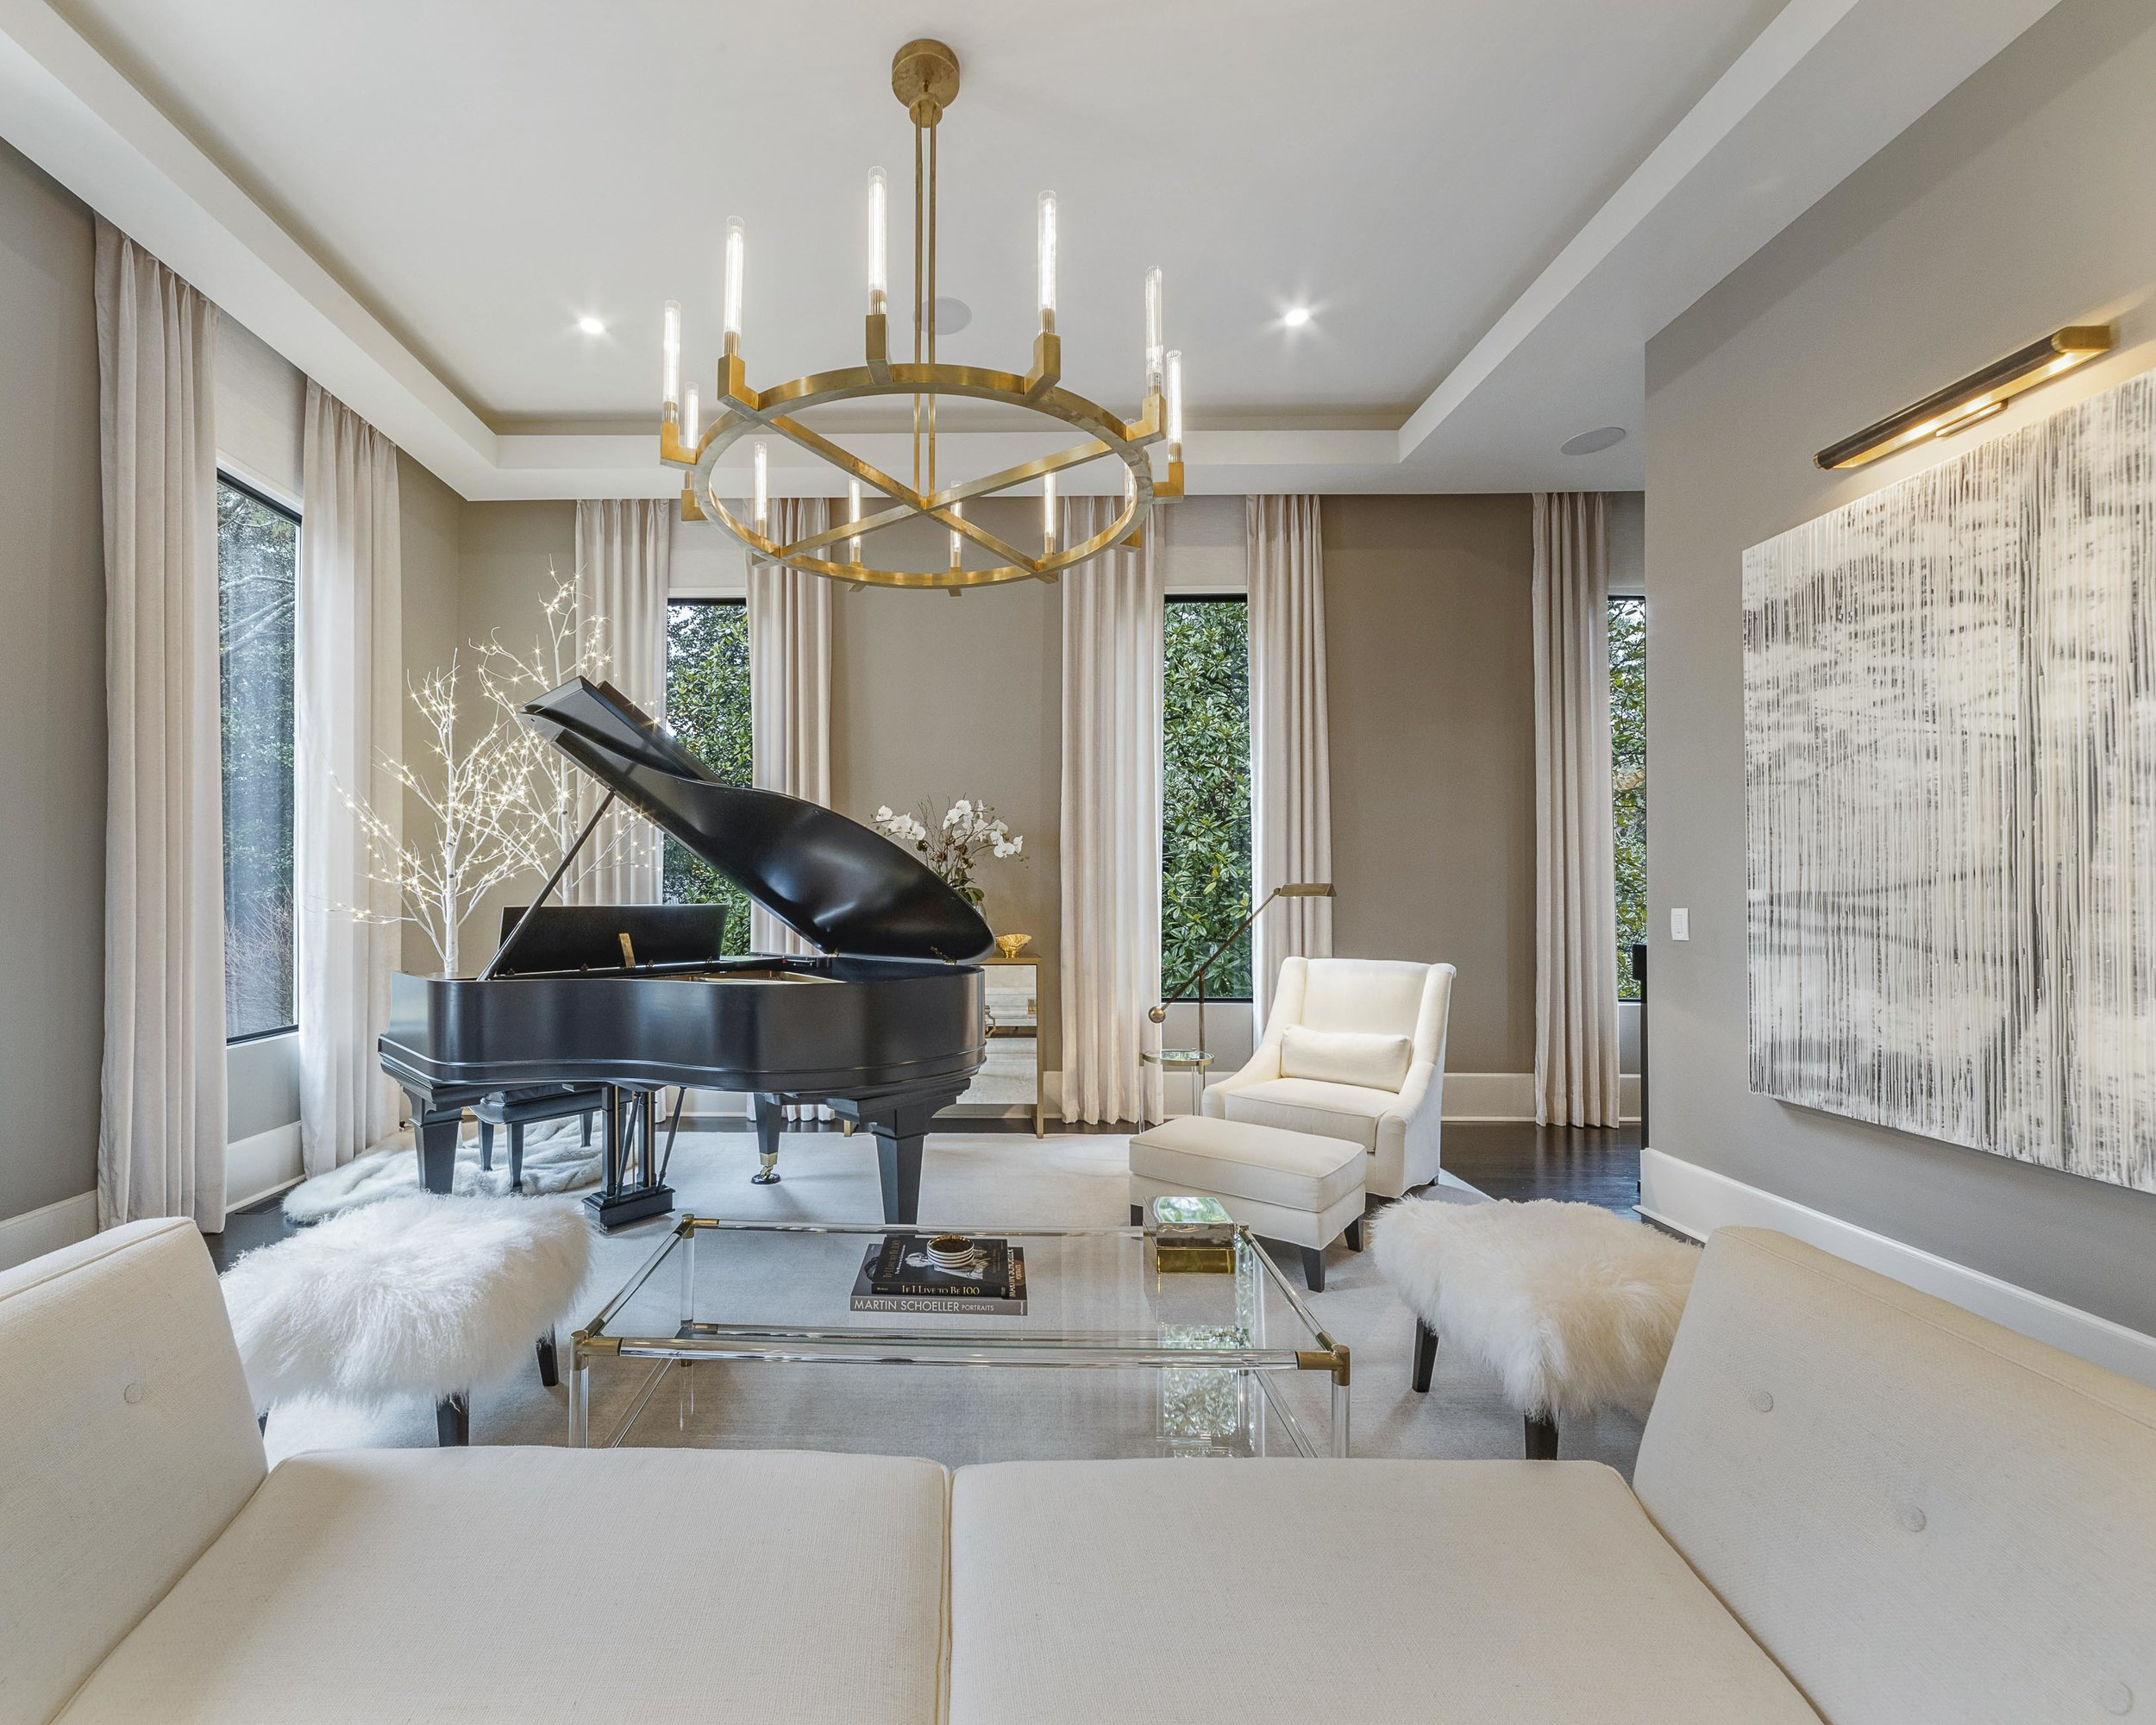 Habersham_front room with piano.jpg